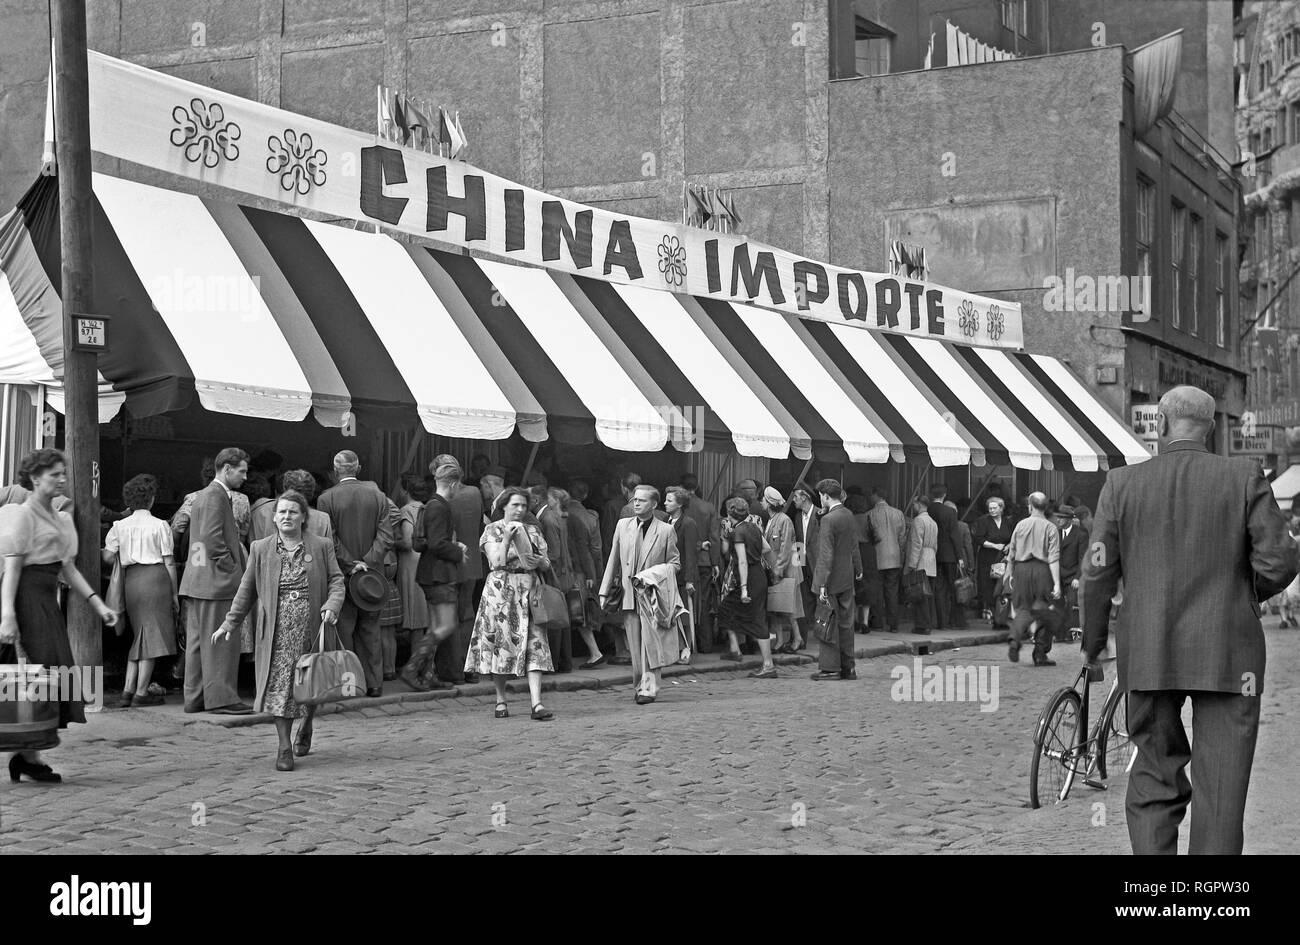 Leipziger Messe, Sale of goods from China, 1954, Große Fleischergasse, Leipzig, Saxony, GDR, Germany - Stock Image